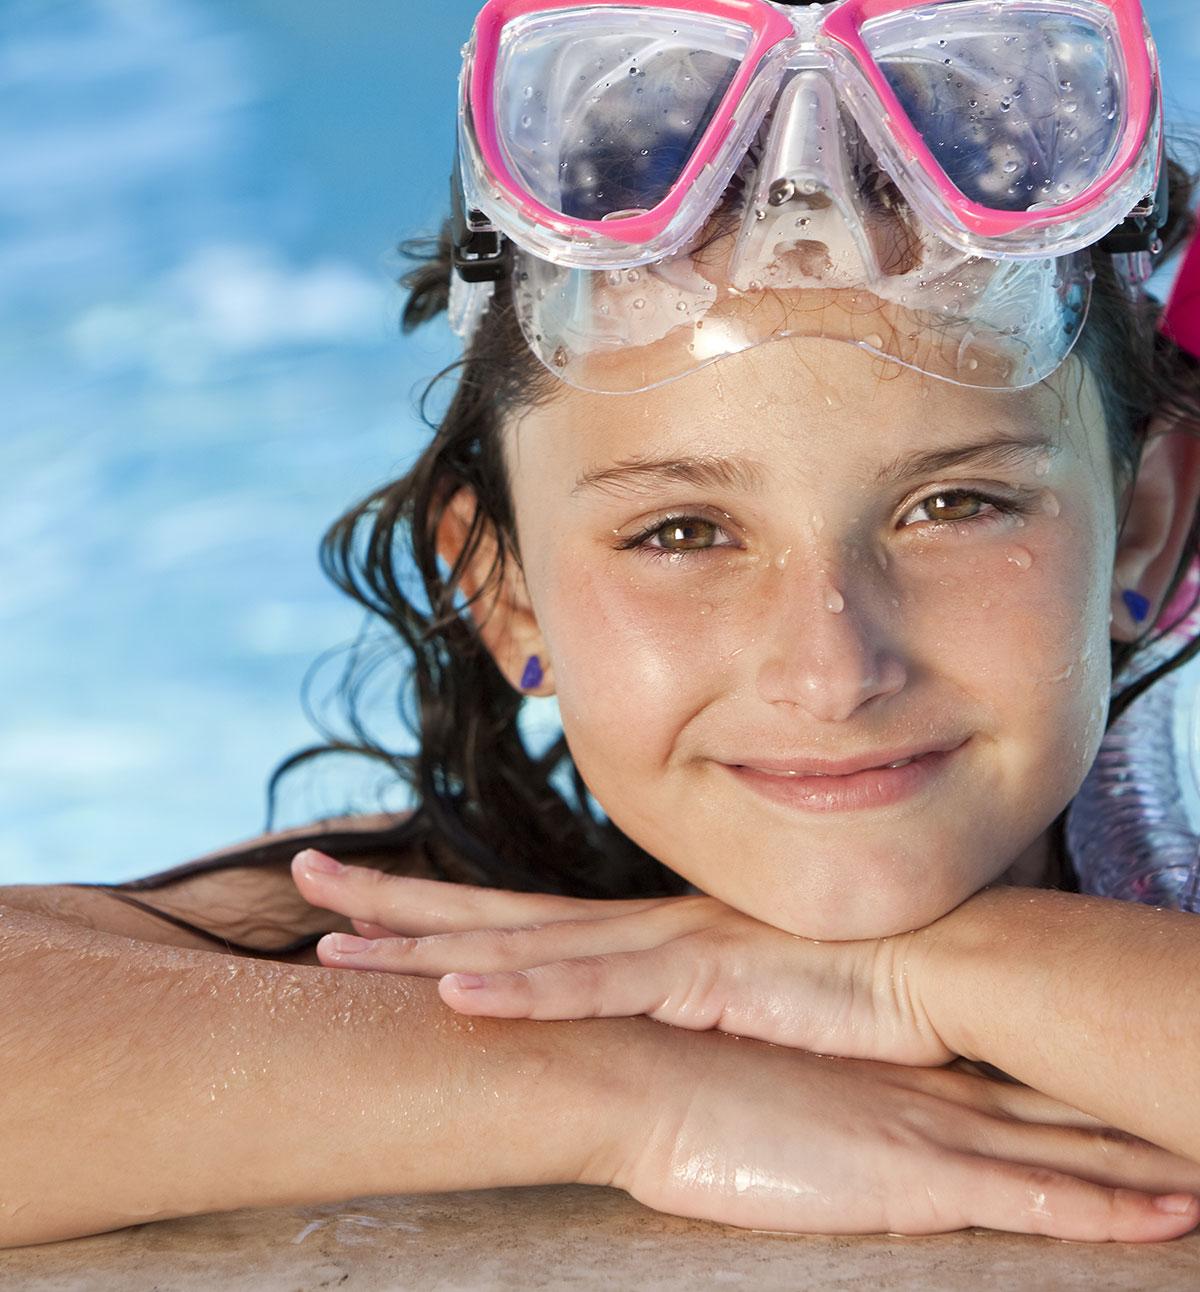 B4School FUN - Alphabet Adventure - U is for Underwater